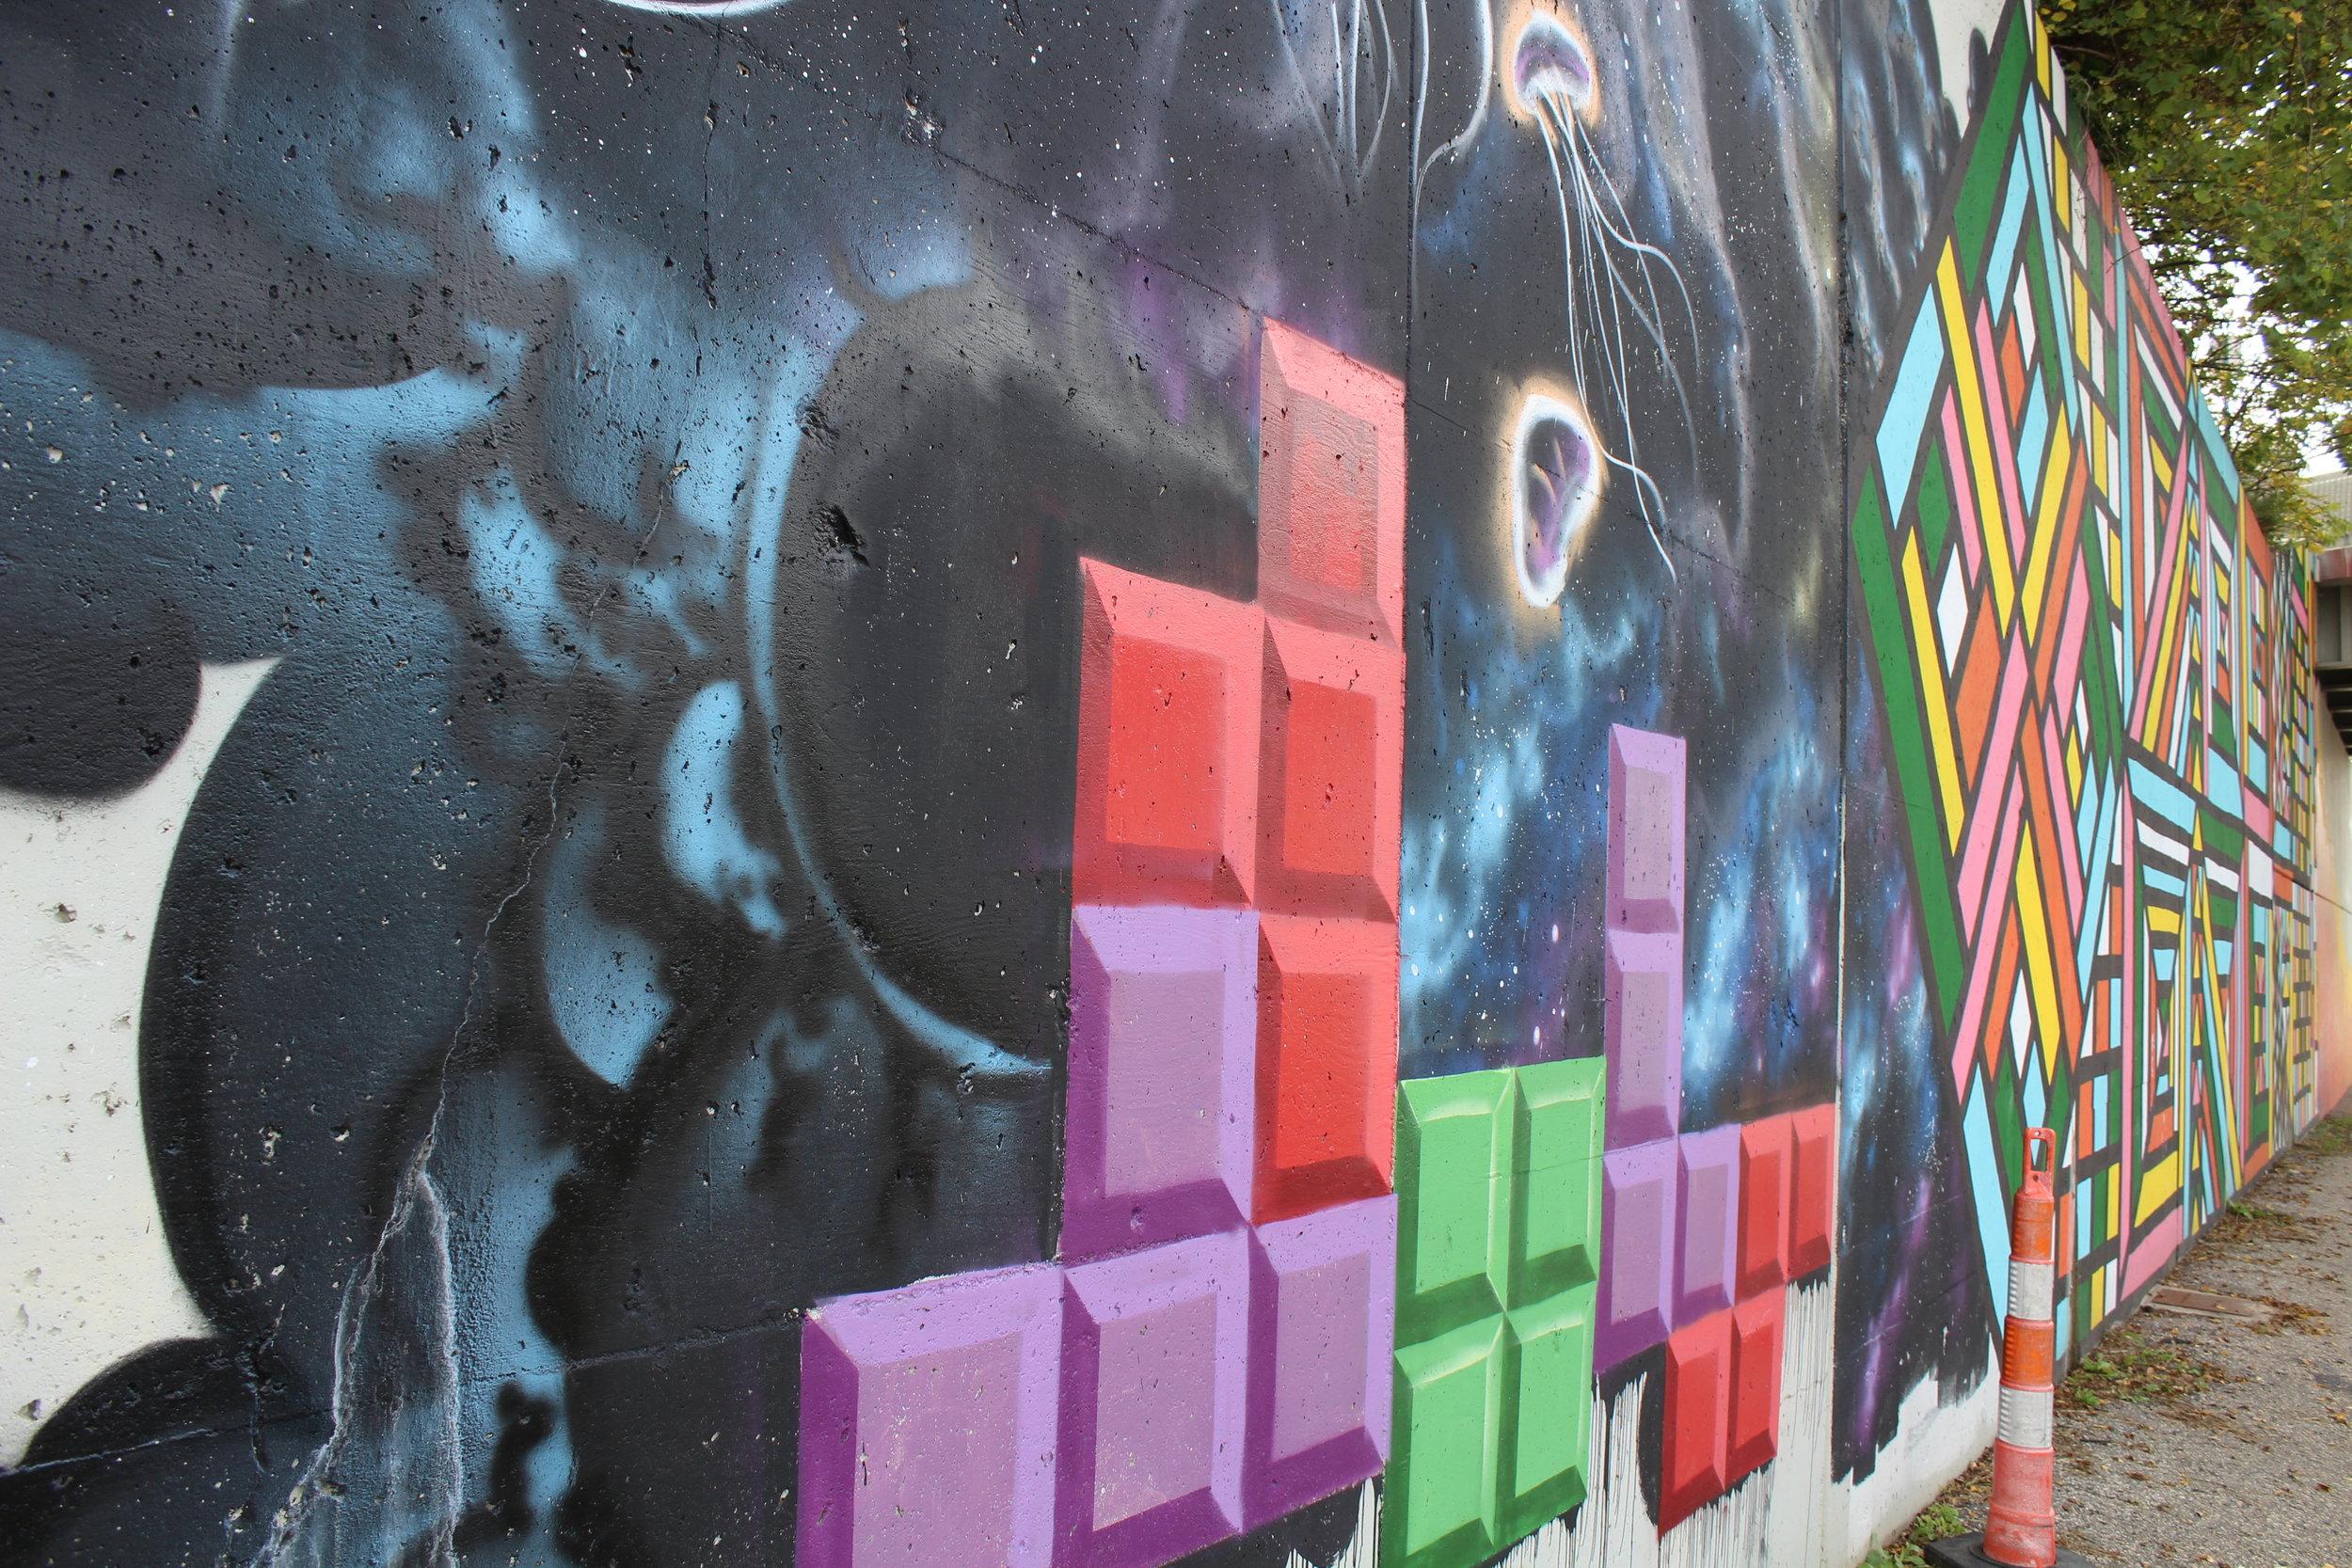 Tetris detail of mural on retaining wall of I-196